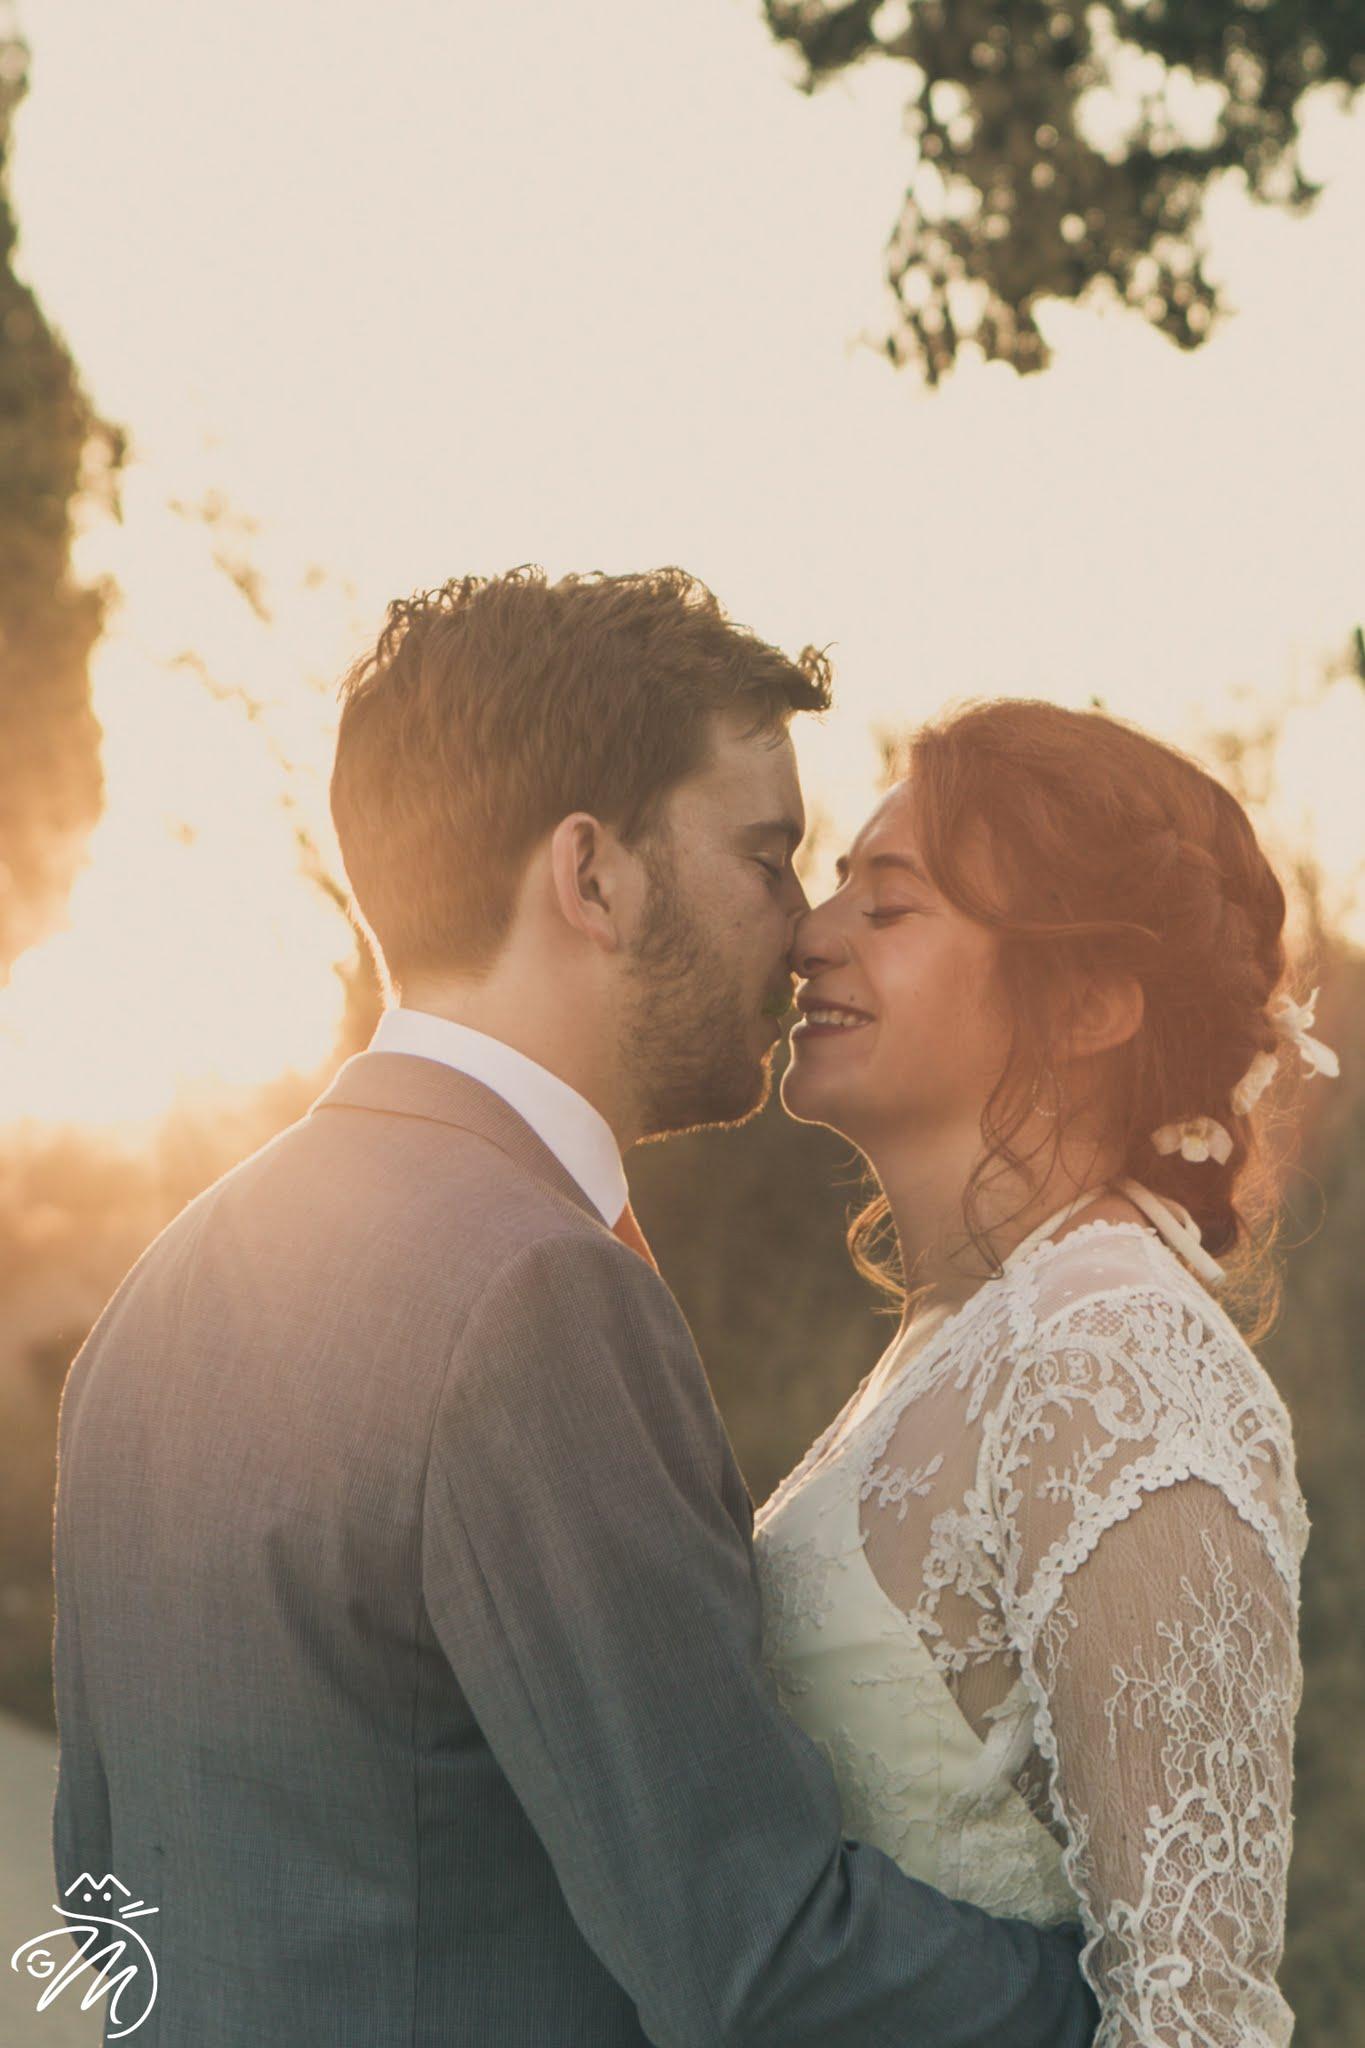 VERTICALI2_LOGO_HOME_PAGE_INTERNATIONAL_PHOTOGRAPHER_IN_ROME_WEDDING_DESTINATION_GIROLAMO_MONTELEONE_-30